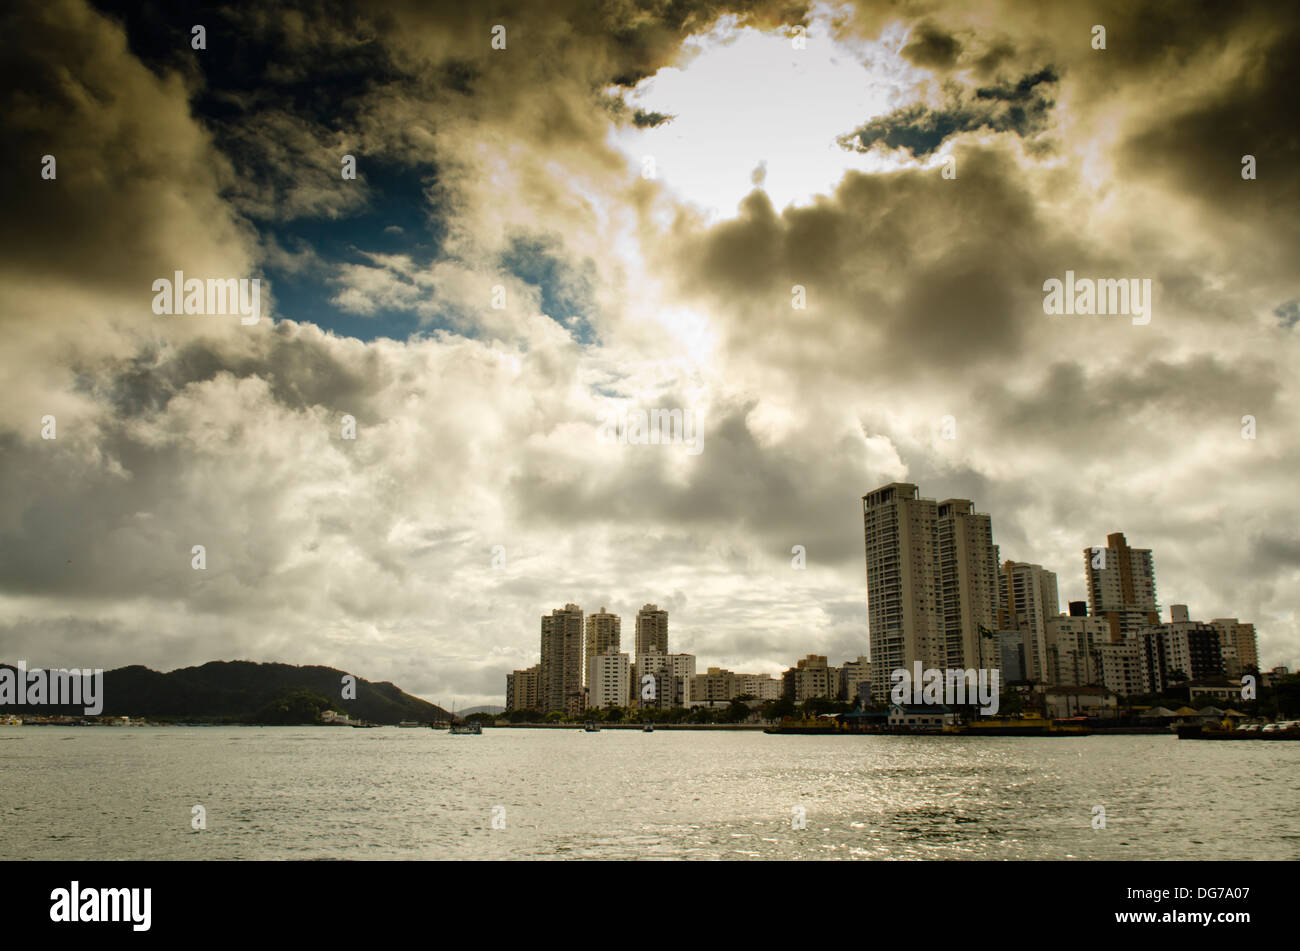 Ville de Santos, Sao Paulo, Brésil. Vue de la ville de Guarujá. Quartier Ponta da Praia Photo Stock